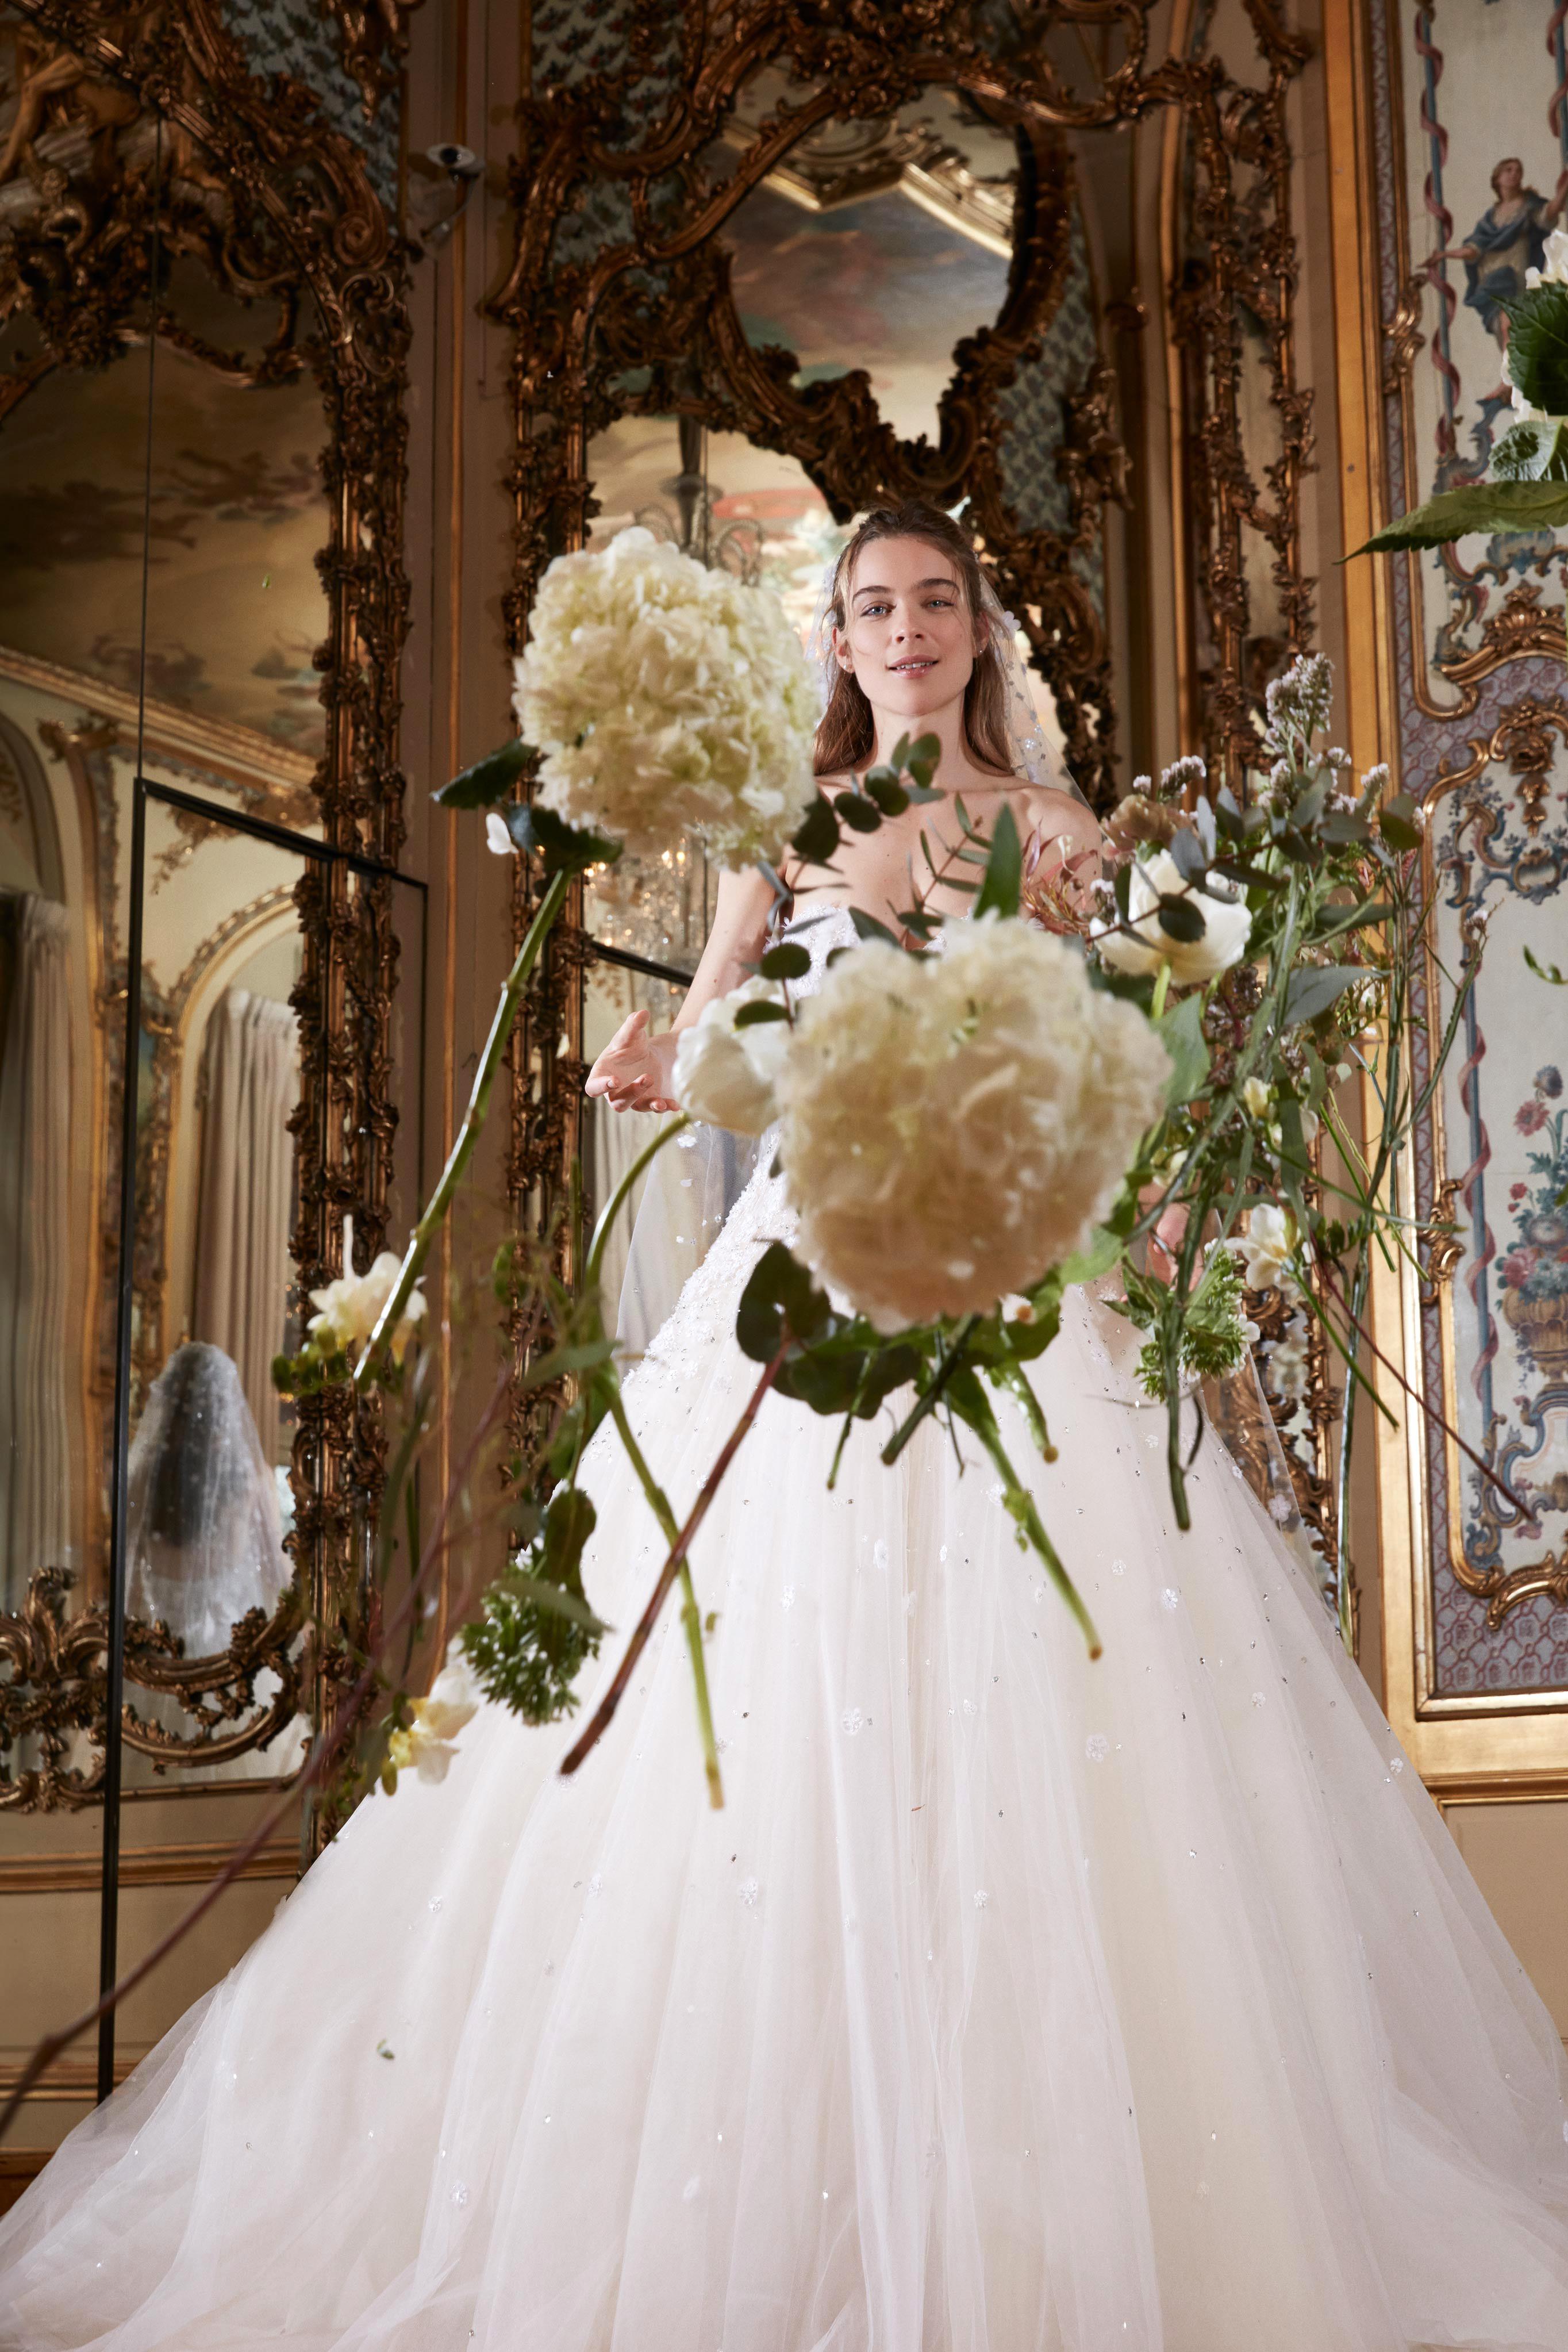 elie saab wedding dress spring 2019 strapless a-line flowers